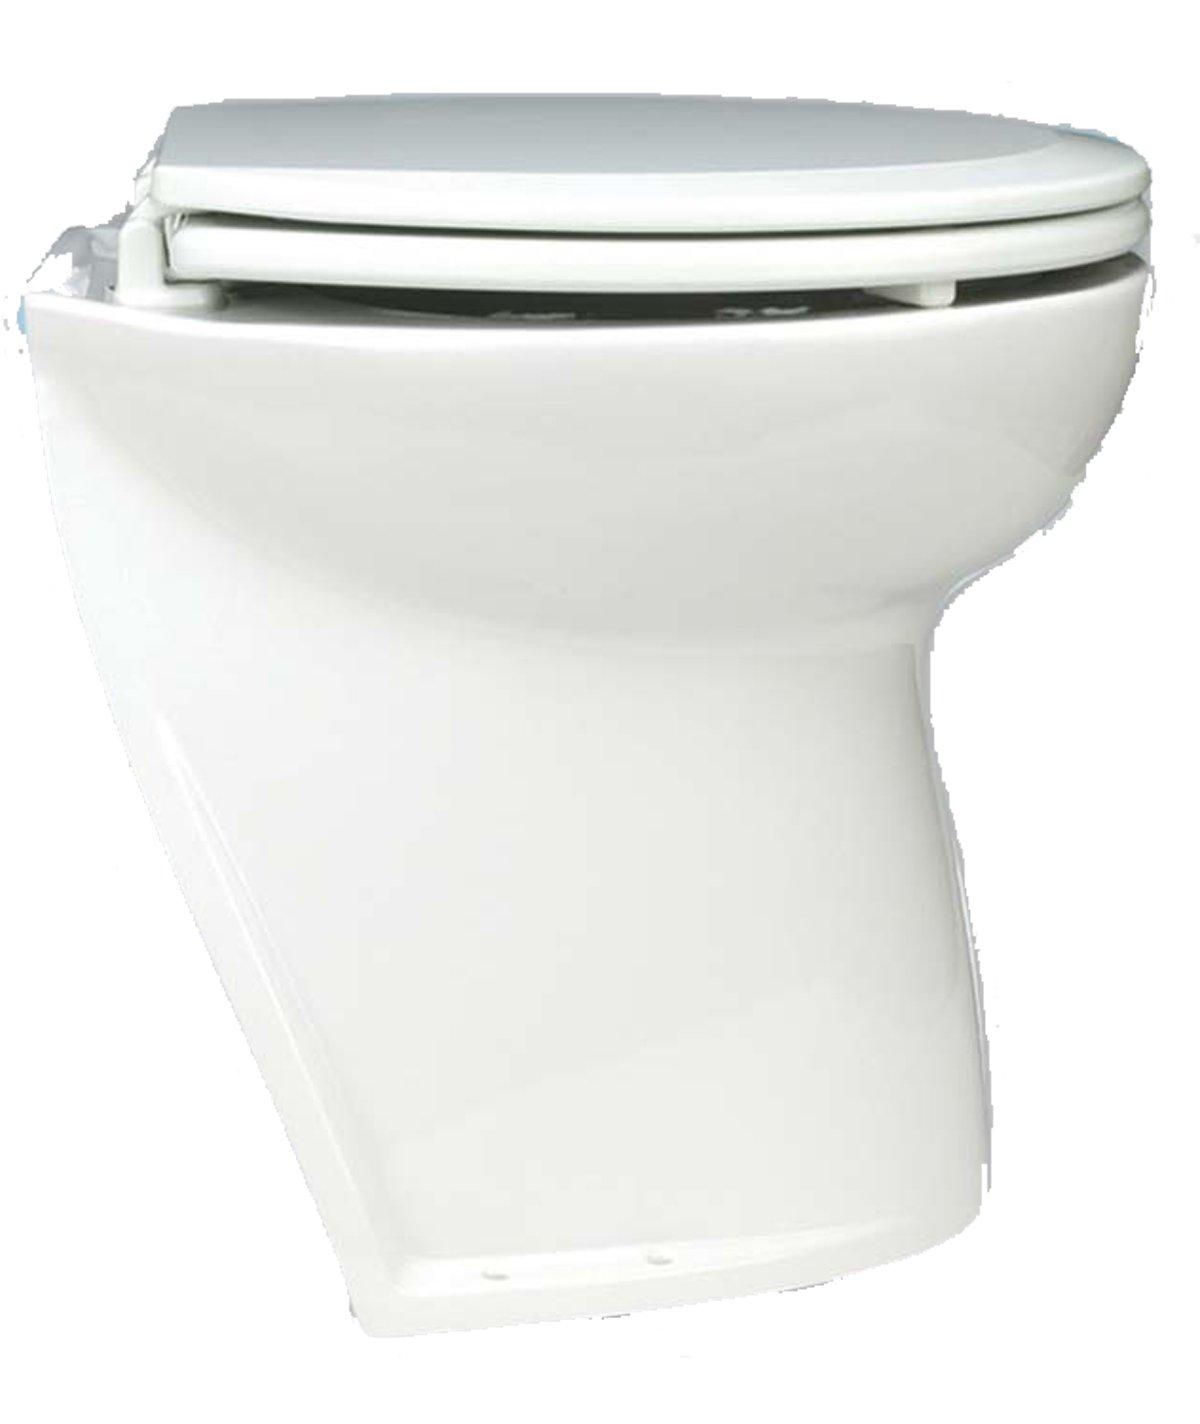 Jabsco Deluxe Flush 17 Elektrotoilette mit abgeschrägtem Rücken